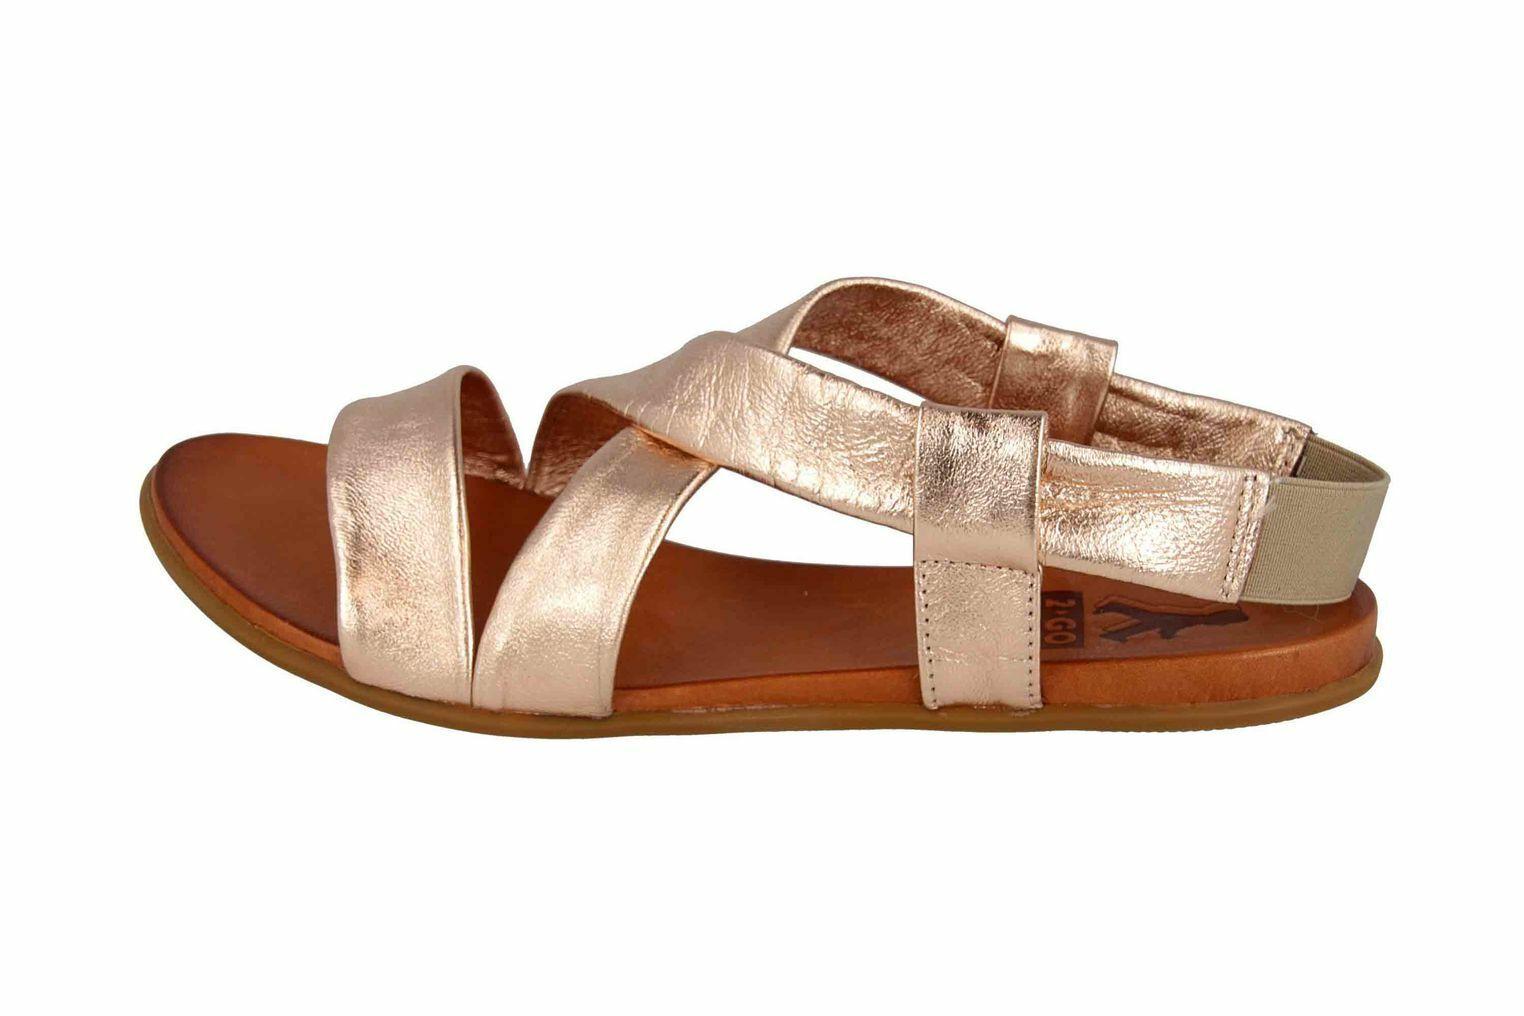 Mustang zapatos sandalias en talla extragrande bronce 8003-802-221 grandes zapatos señora